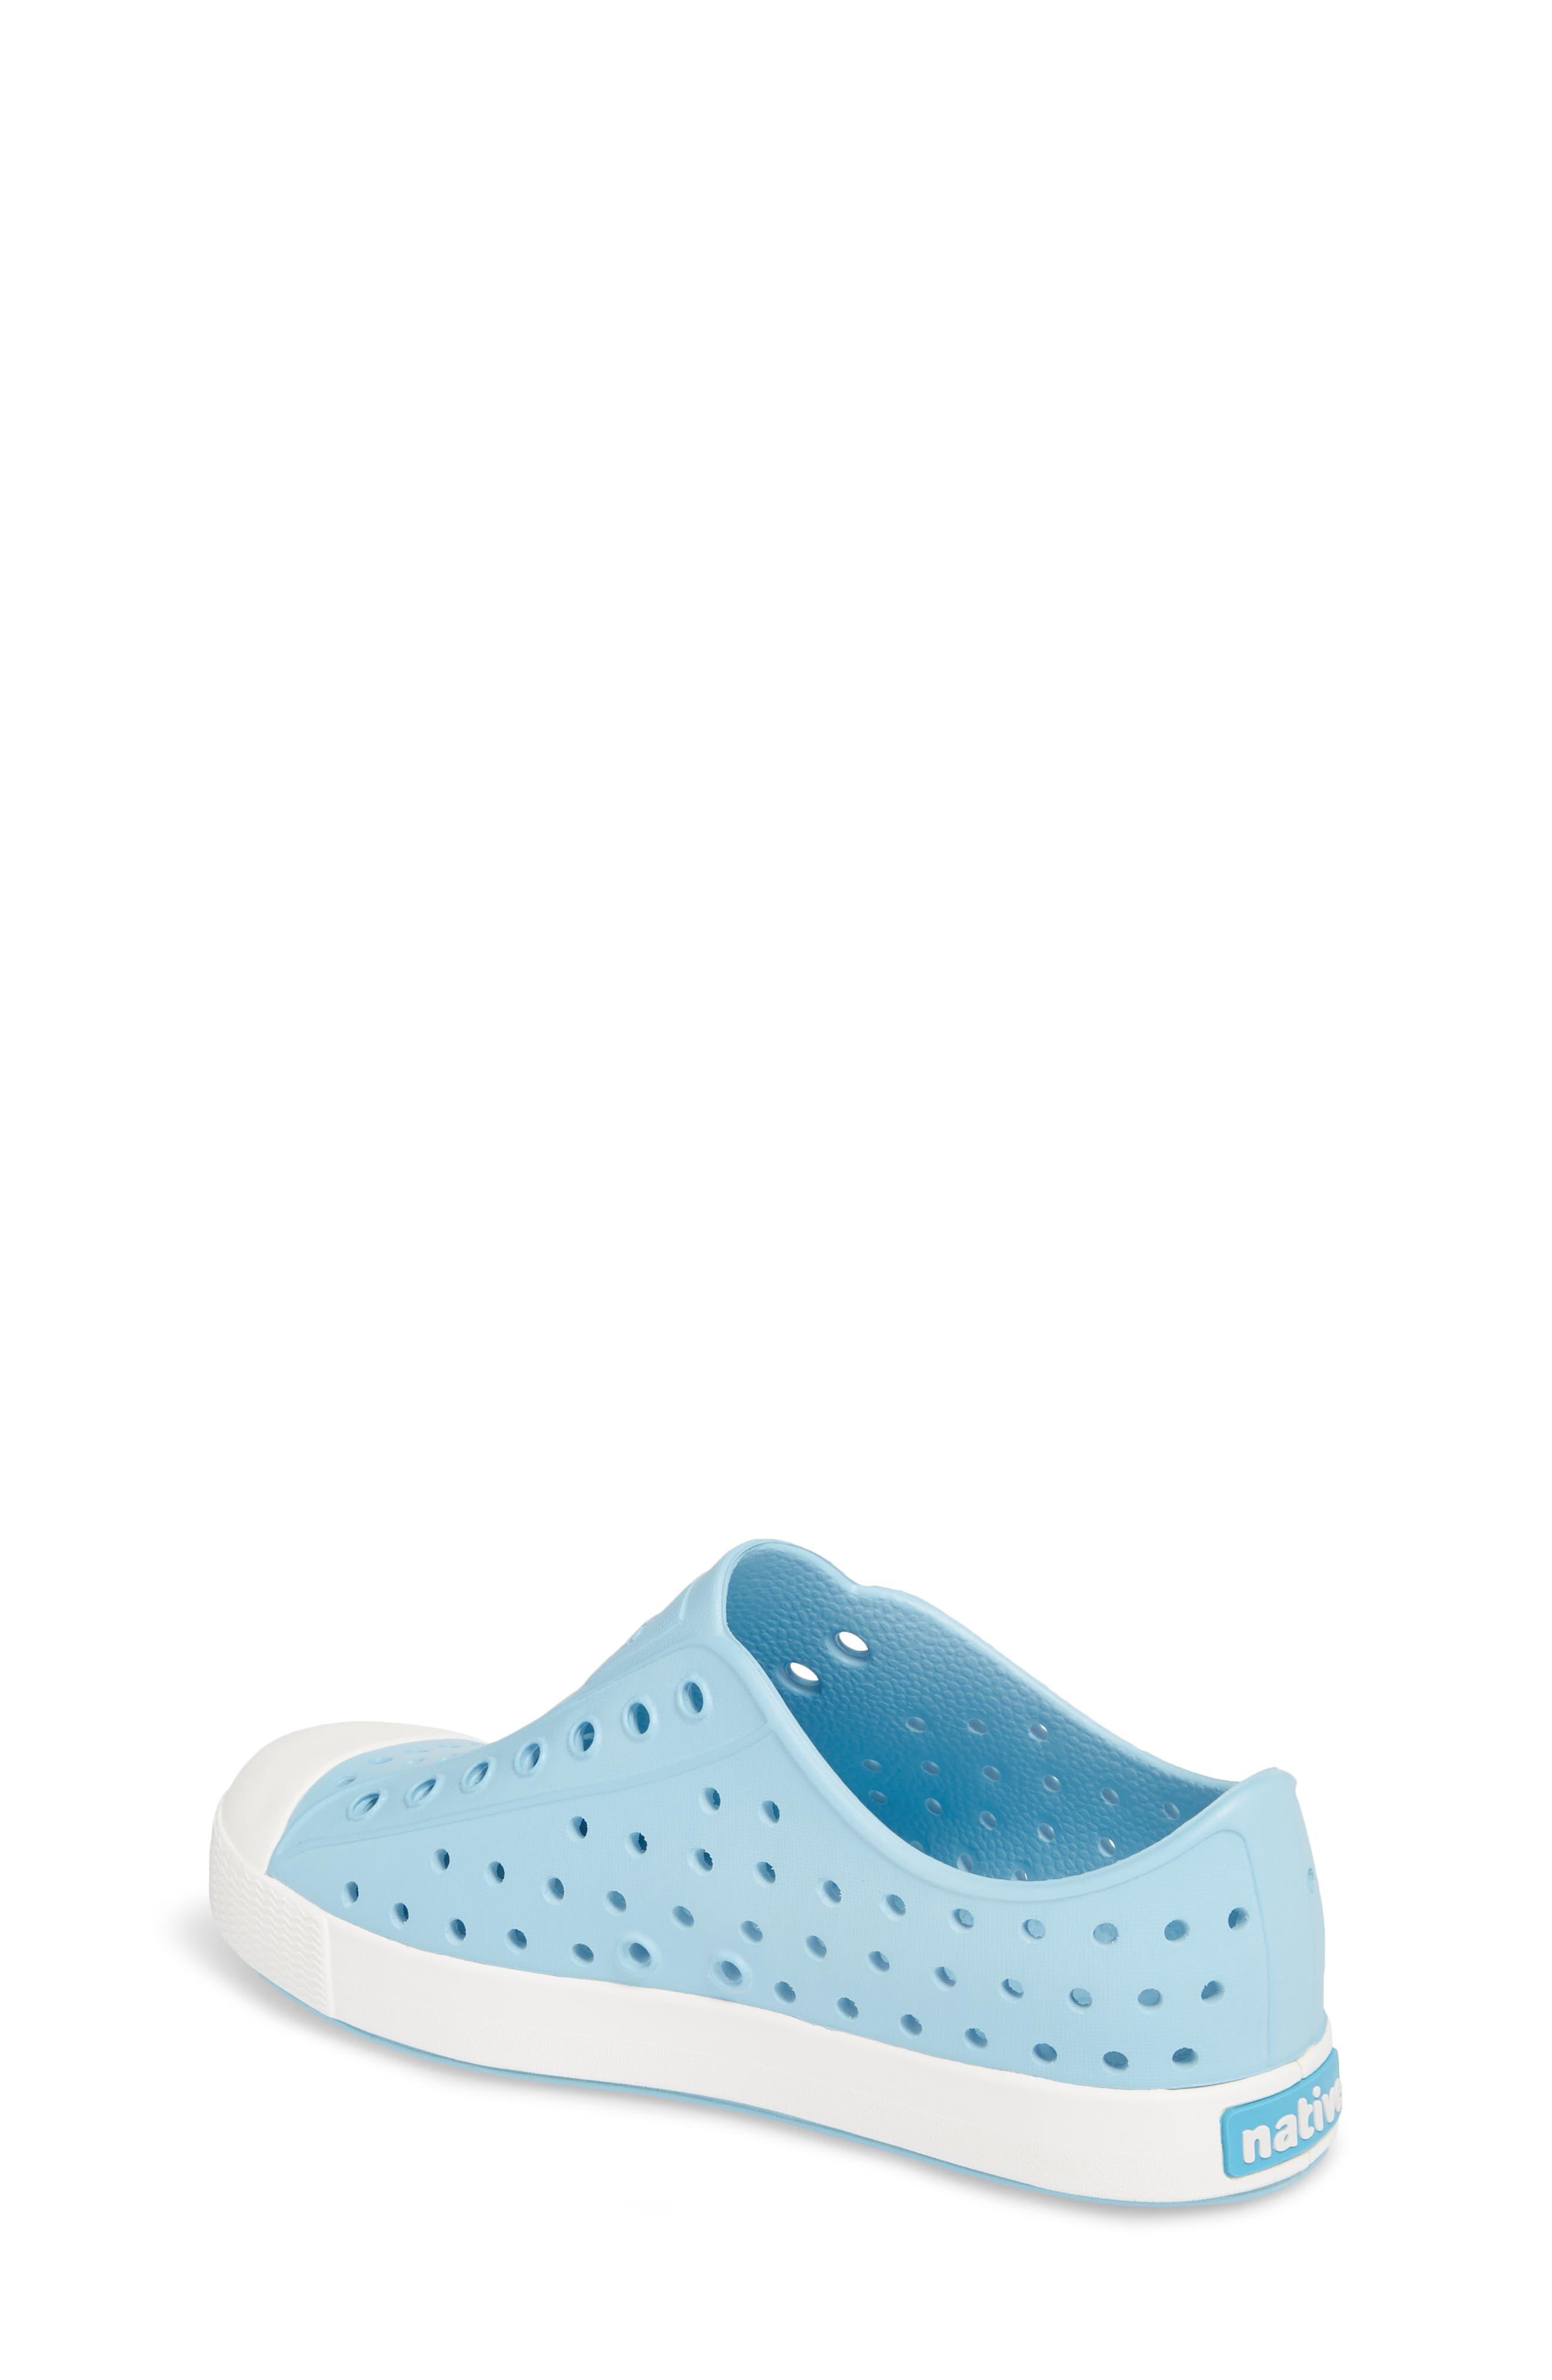 'Jefferson' Water Friendly Slip-On Sneaker,                             Alternate thumbnail 76, color,